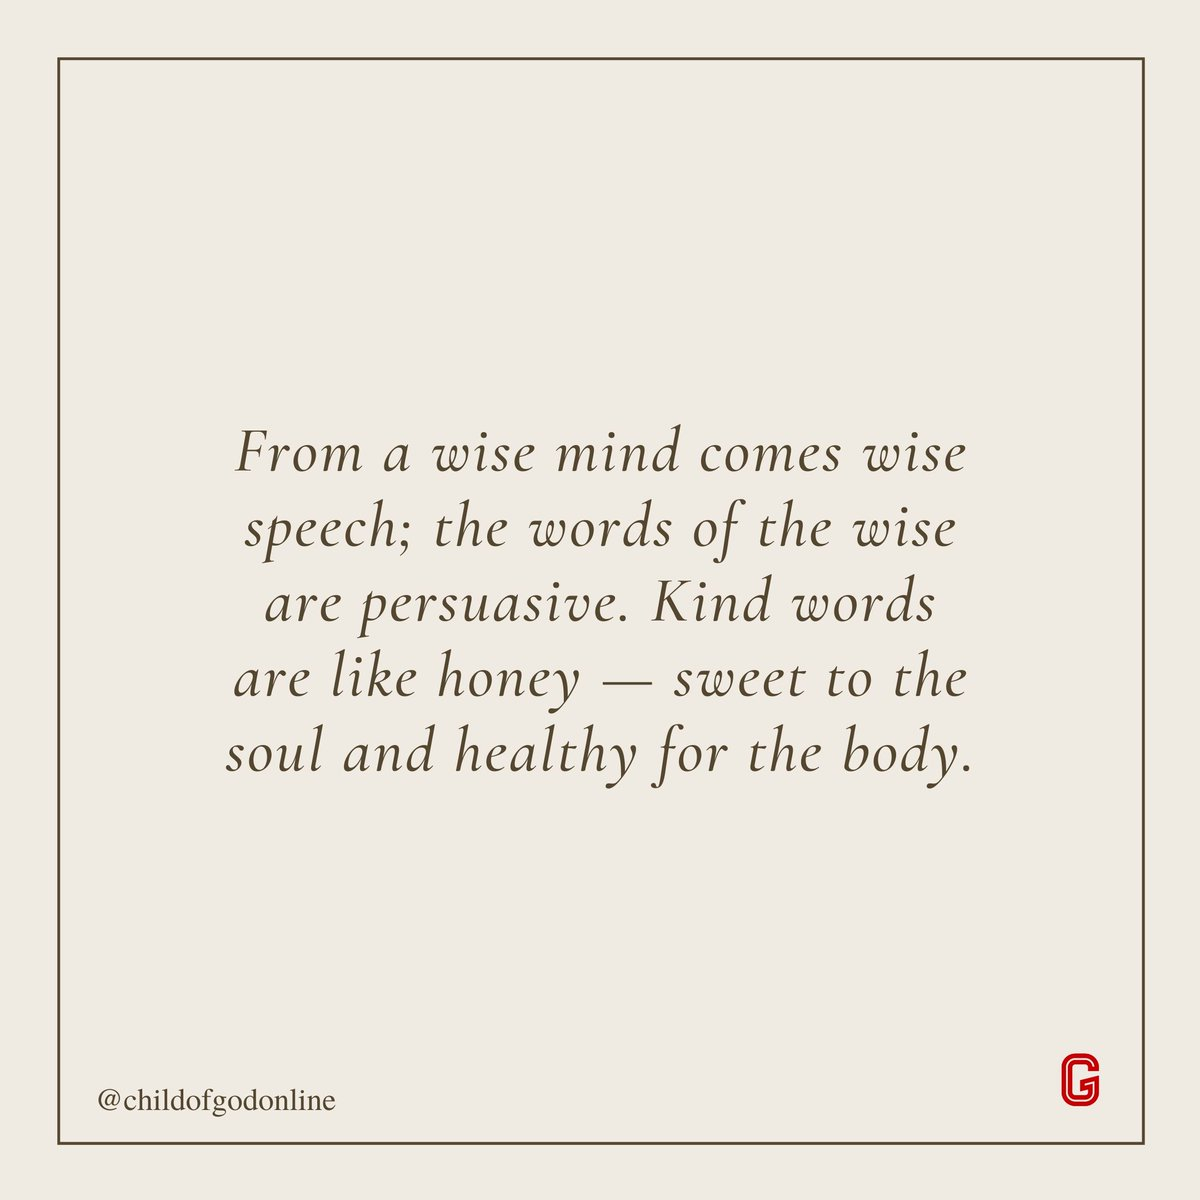 Kind words can heal the heart and mind.  #ChildOfGod #AlmightyGod #God #GodFirst #Christian #Jewish #Muslims #Religion #Faith #Blessings #GodIsLove #GodsPlan #Prayers #Love #Soul #Health https://t.co/xqxngDl4uq